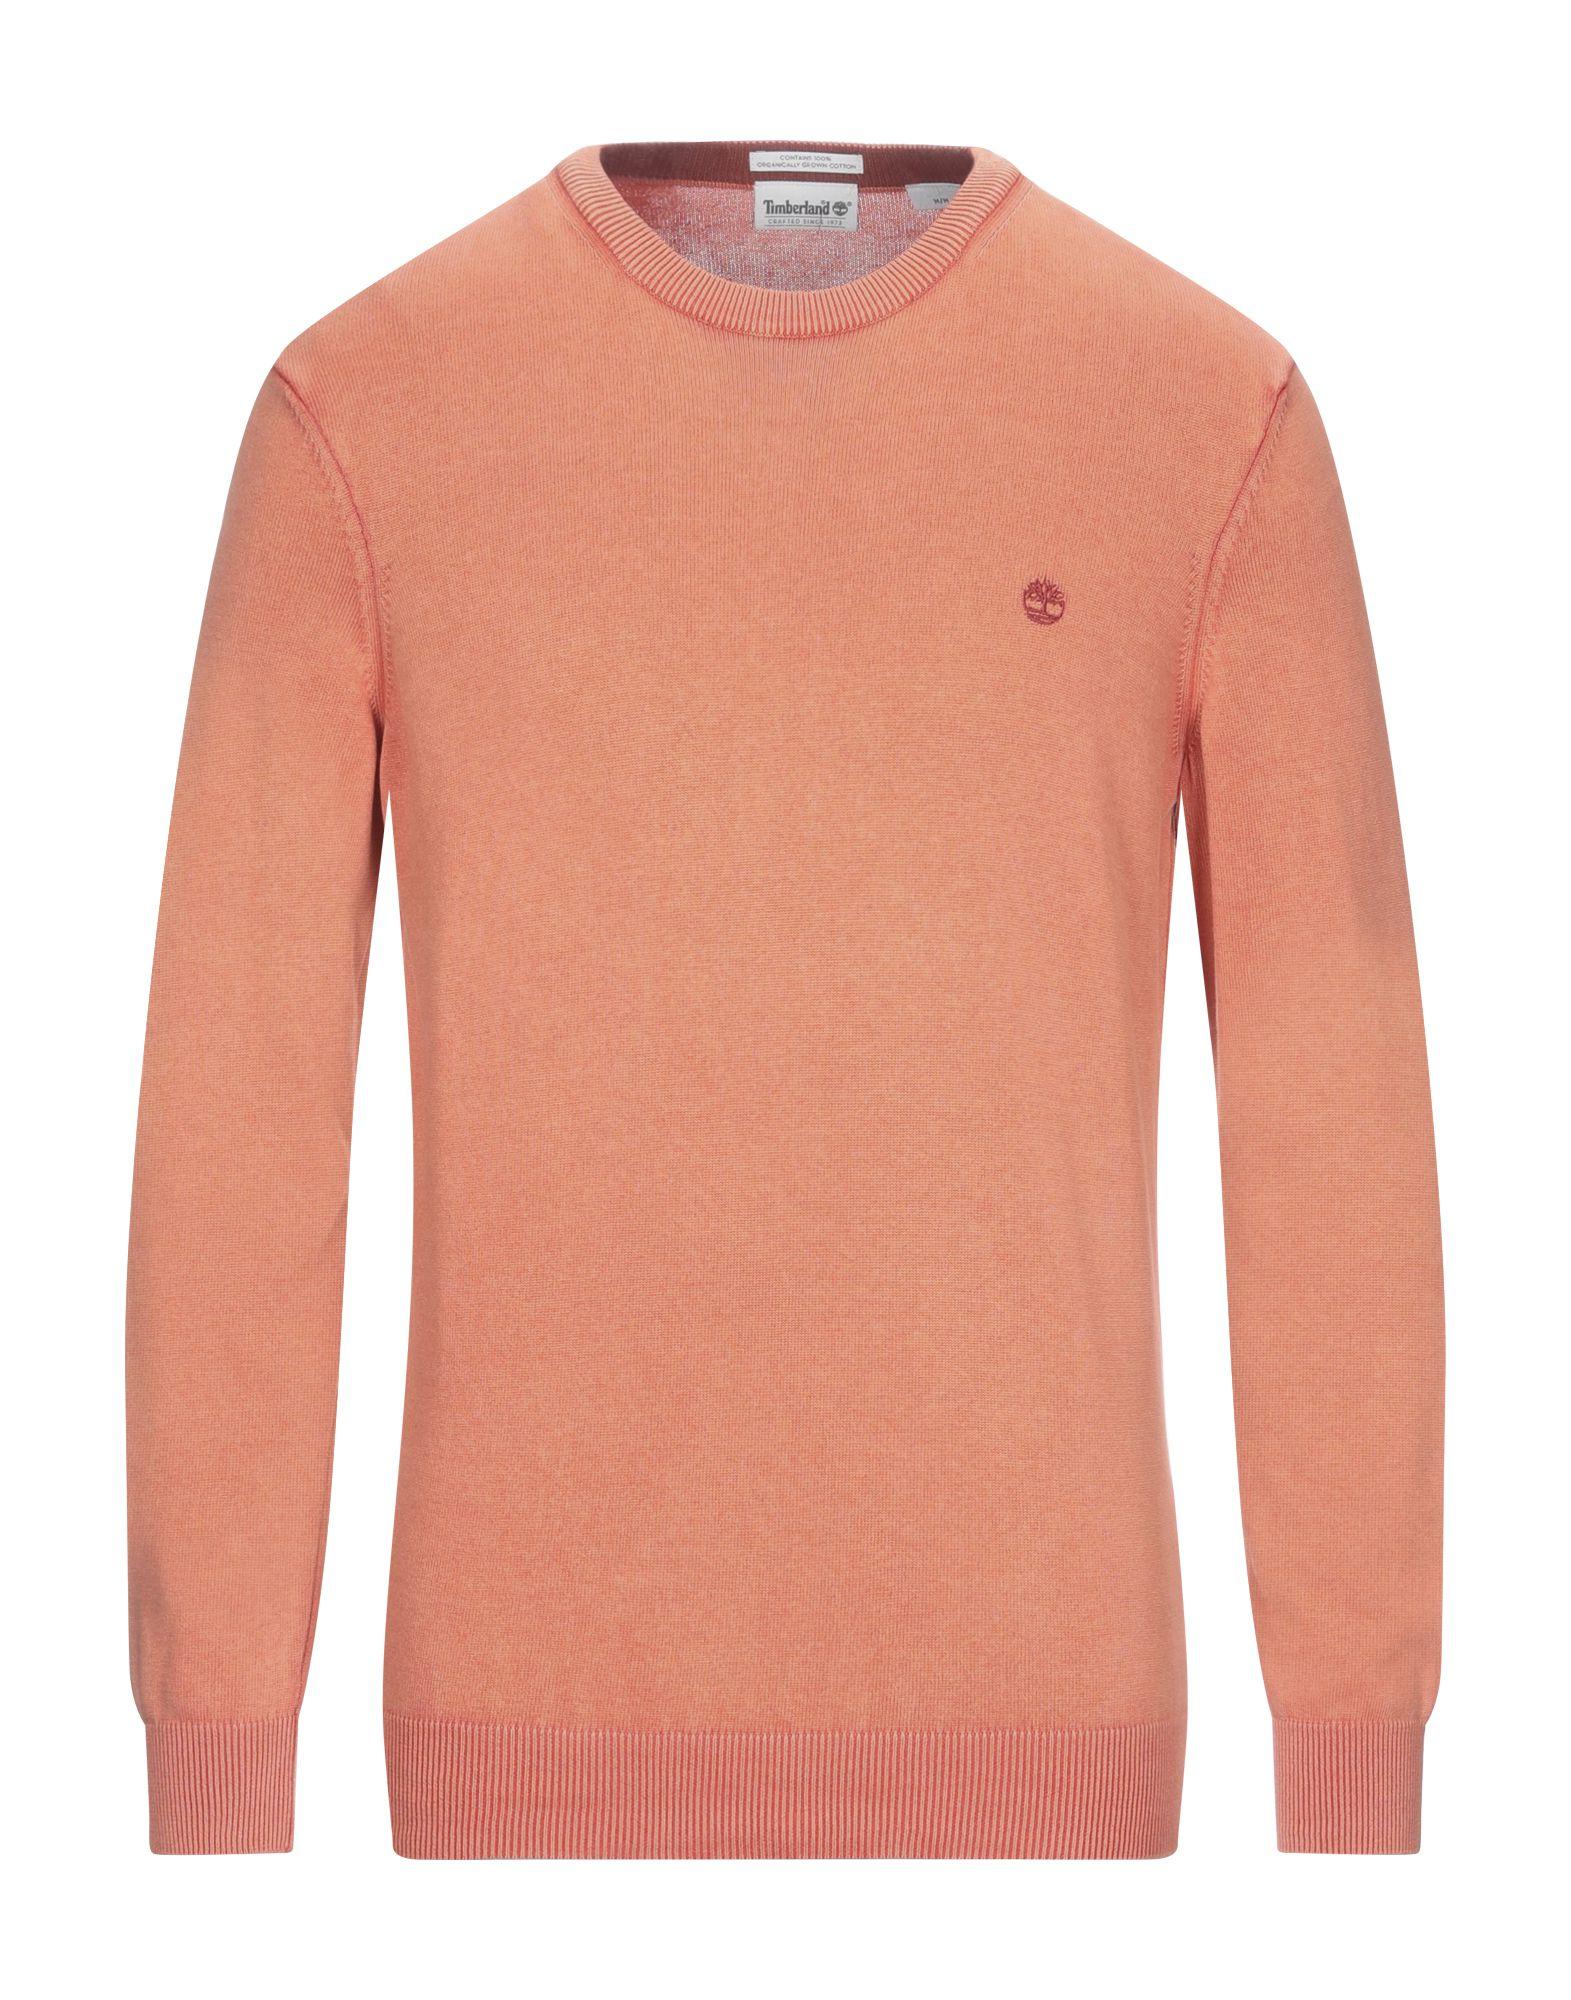 TIMBERLAND Sweaters - Item 14086012